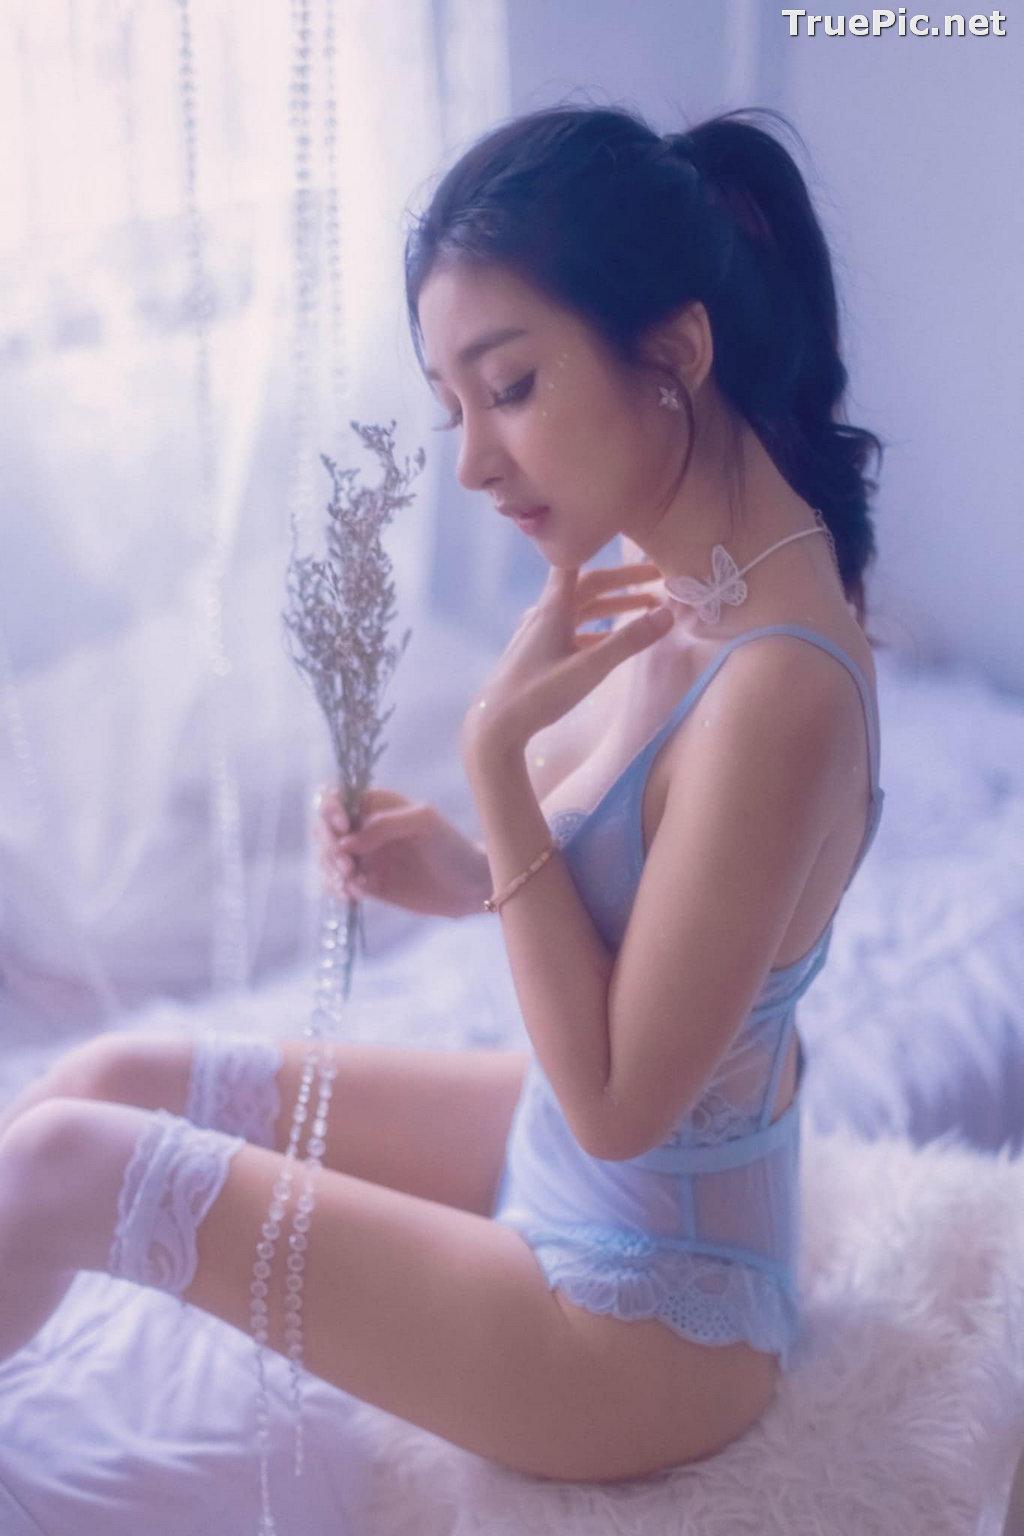 Image Thailand Sexy Model - Pattamaporn Keawkum - Blue Transparent Lingerie - TruePic.net - Picture-7